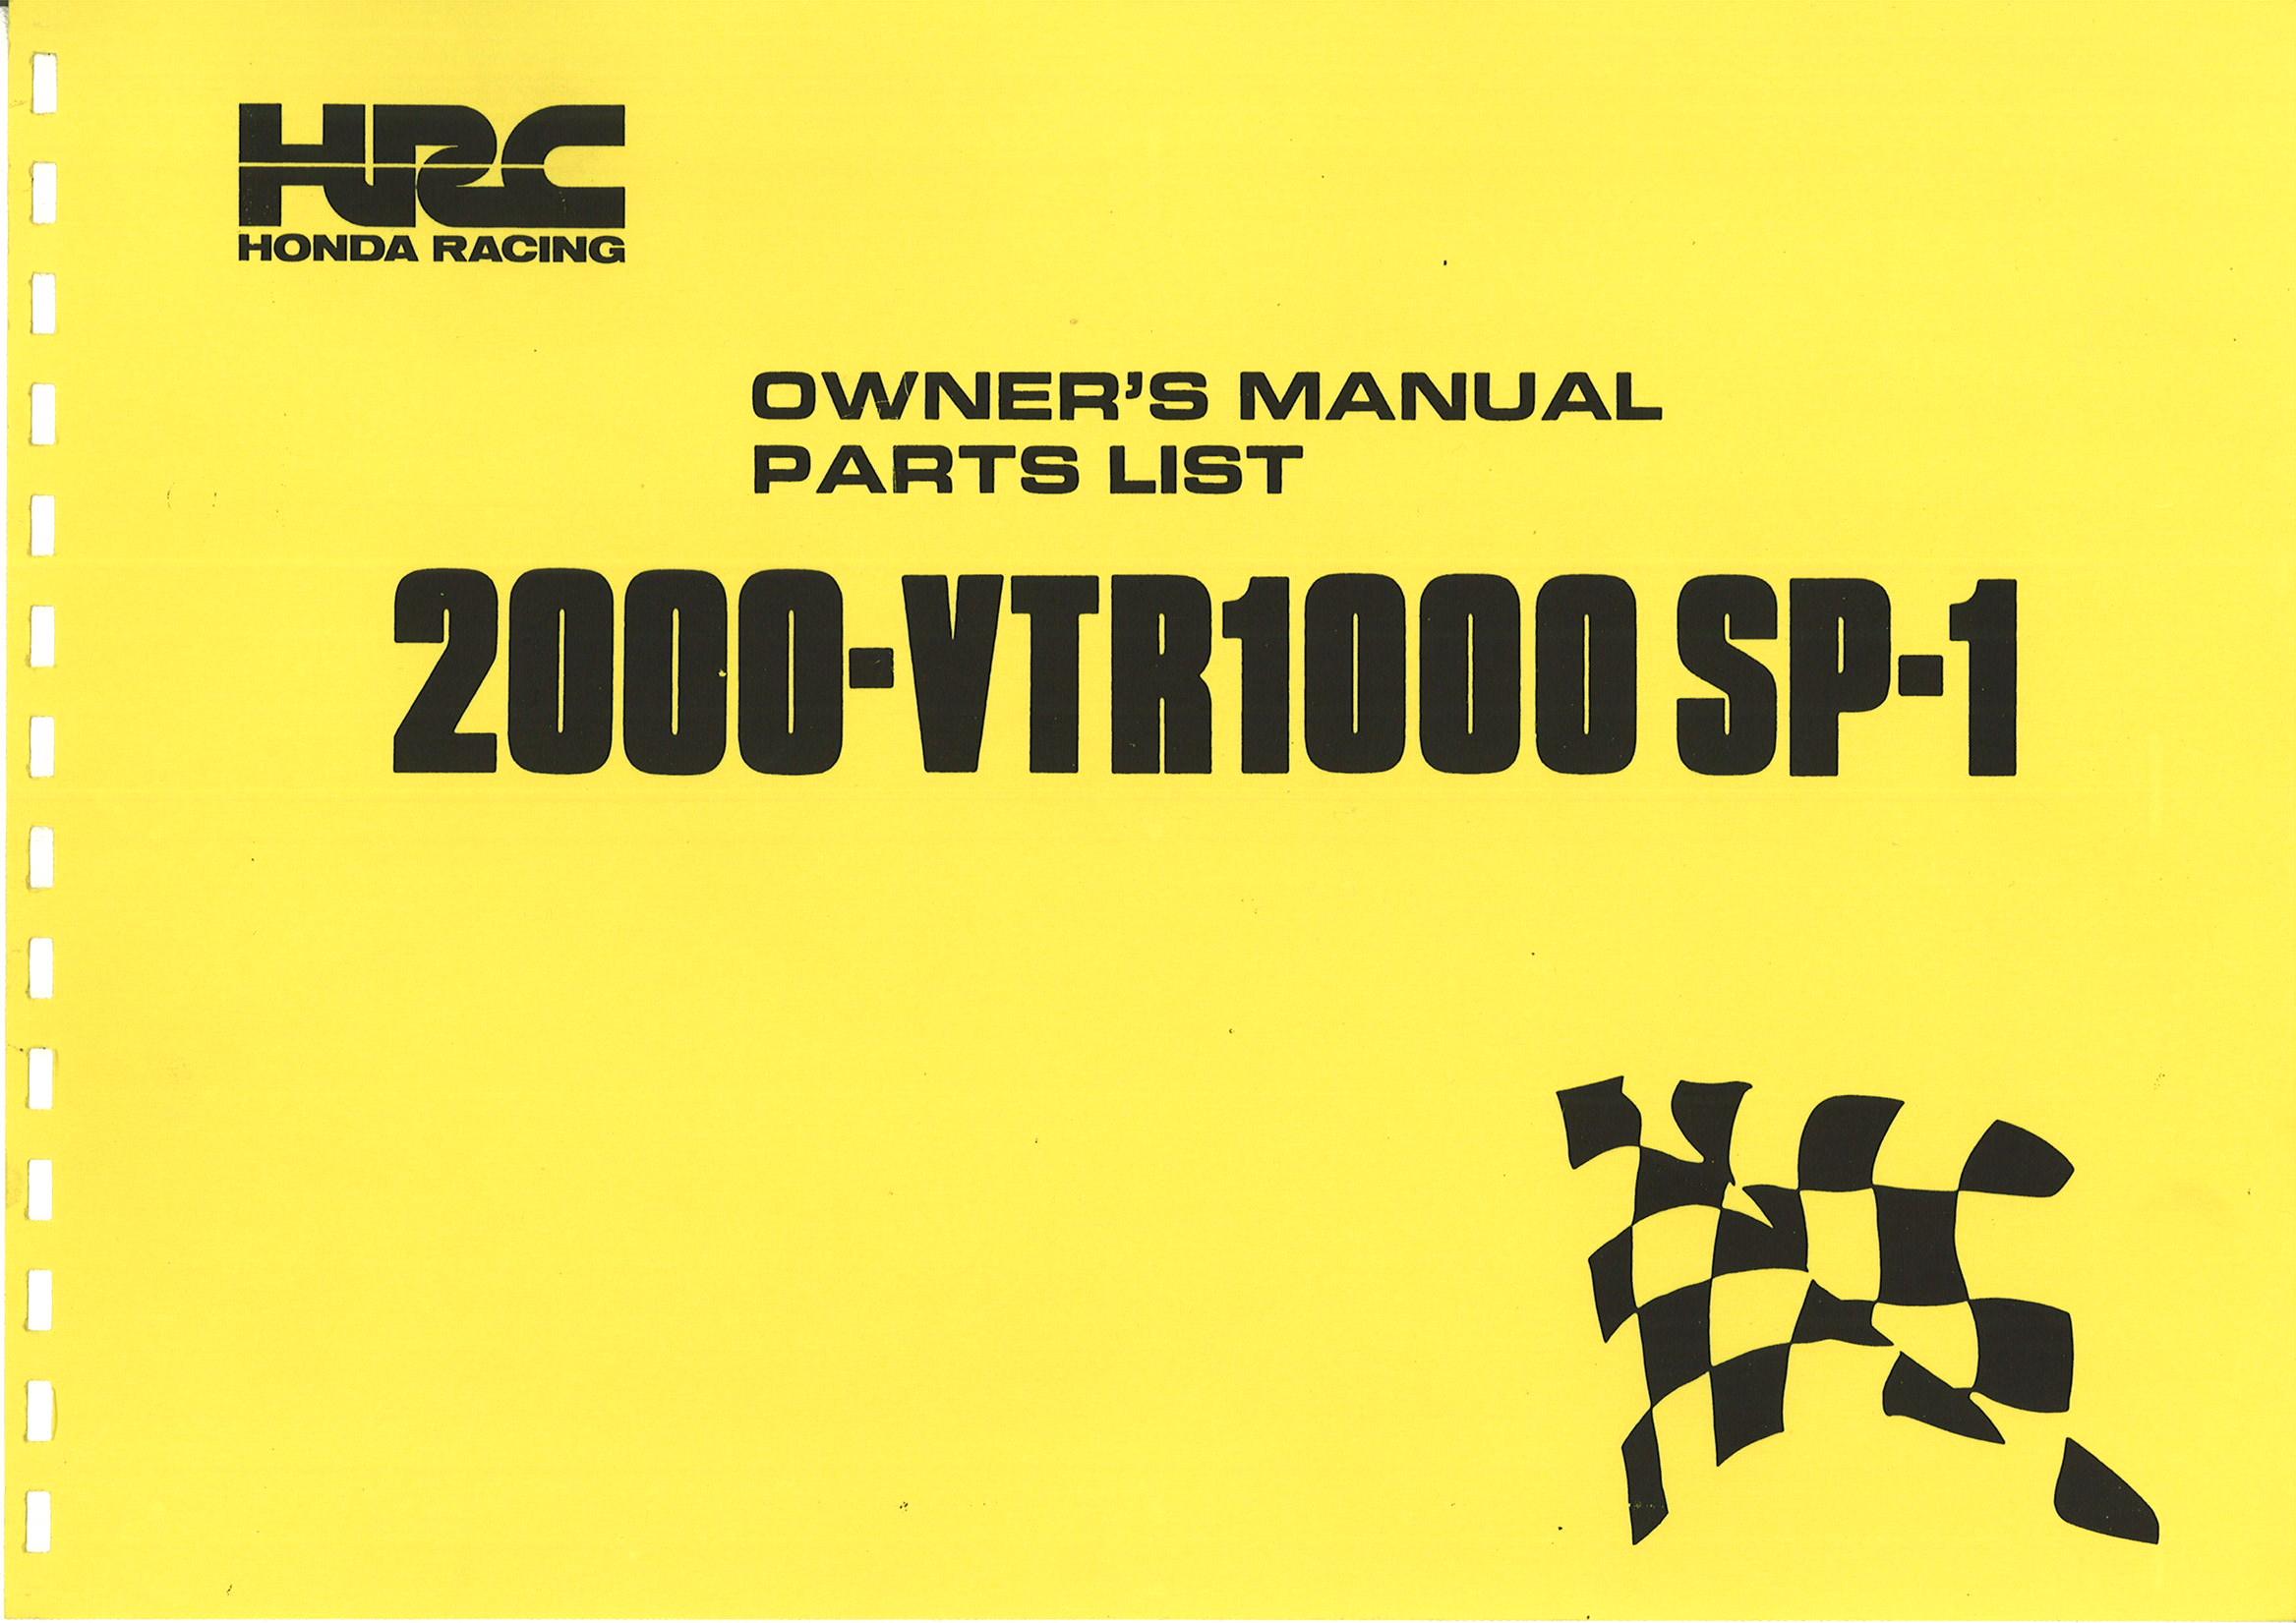 Parts list for Honda VTR1000SP1 (2000)